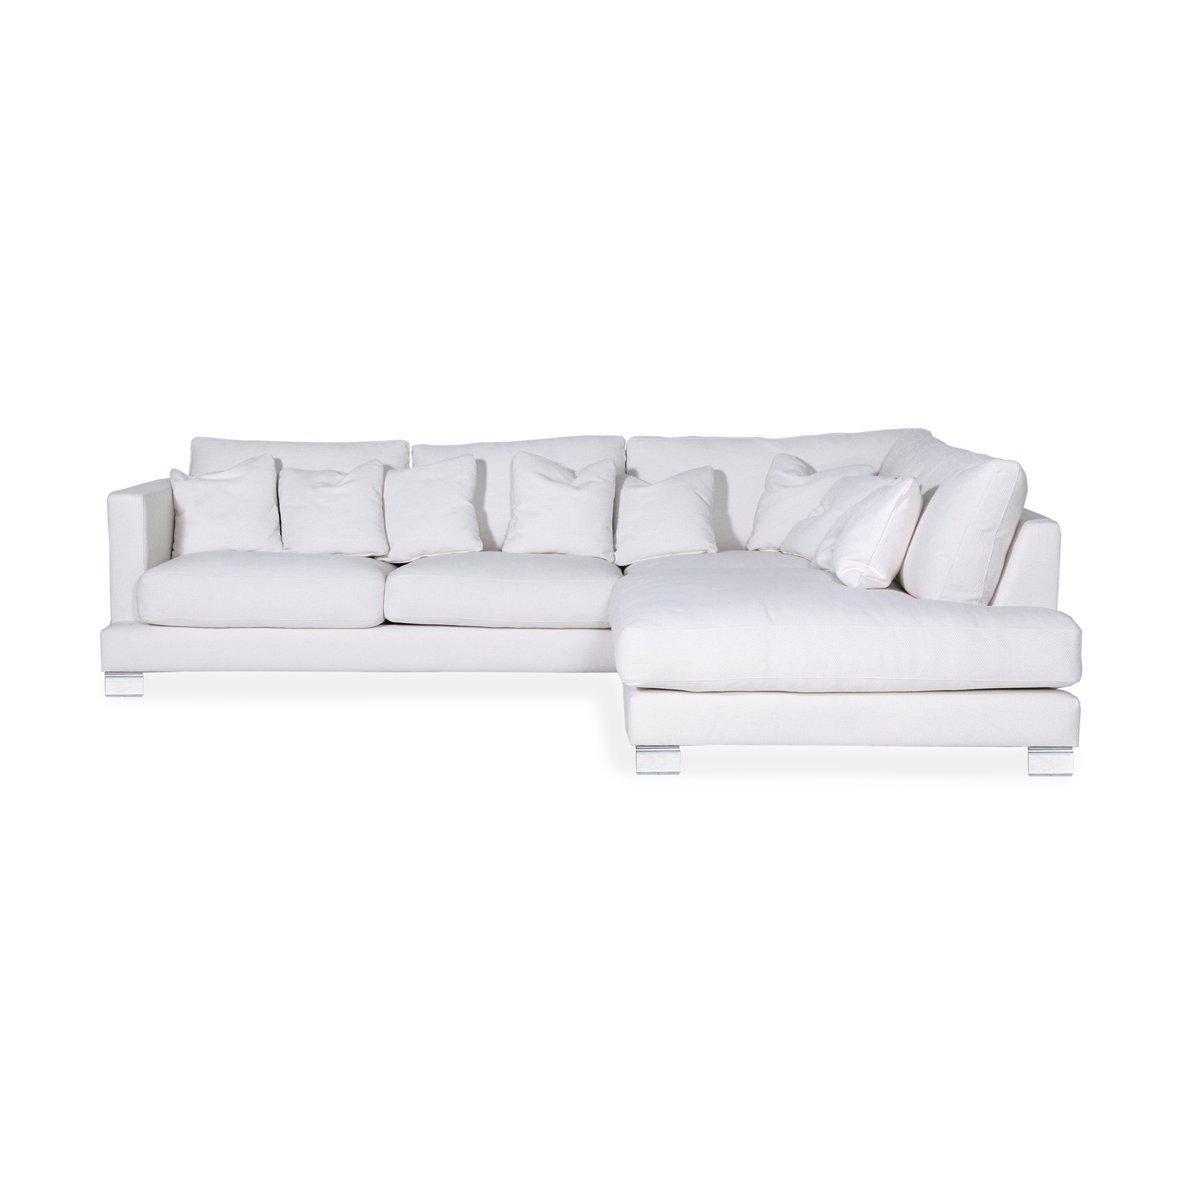 canap d 39 angle design nice meubles et atmosph re. Black Bedroom Furniture Sets. Home Design Ideas